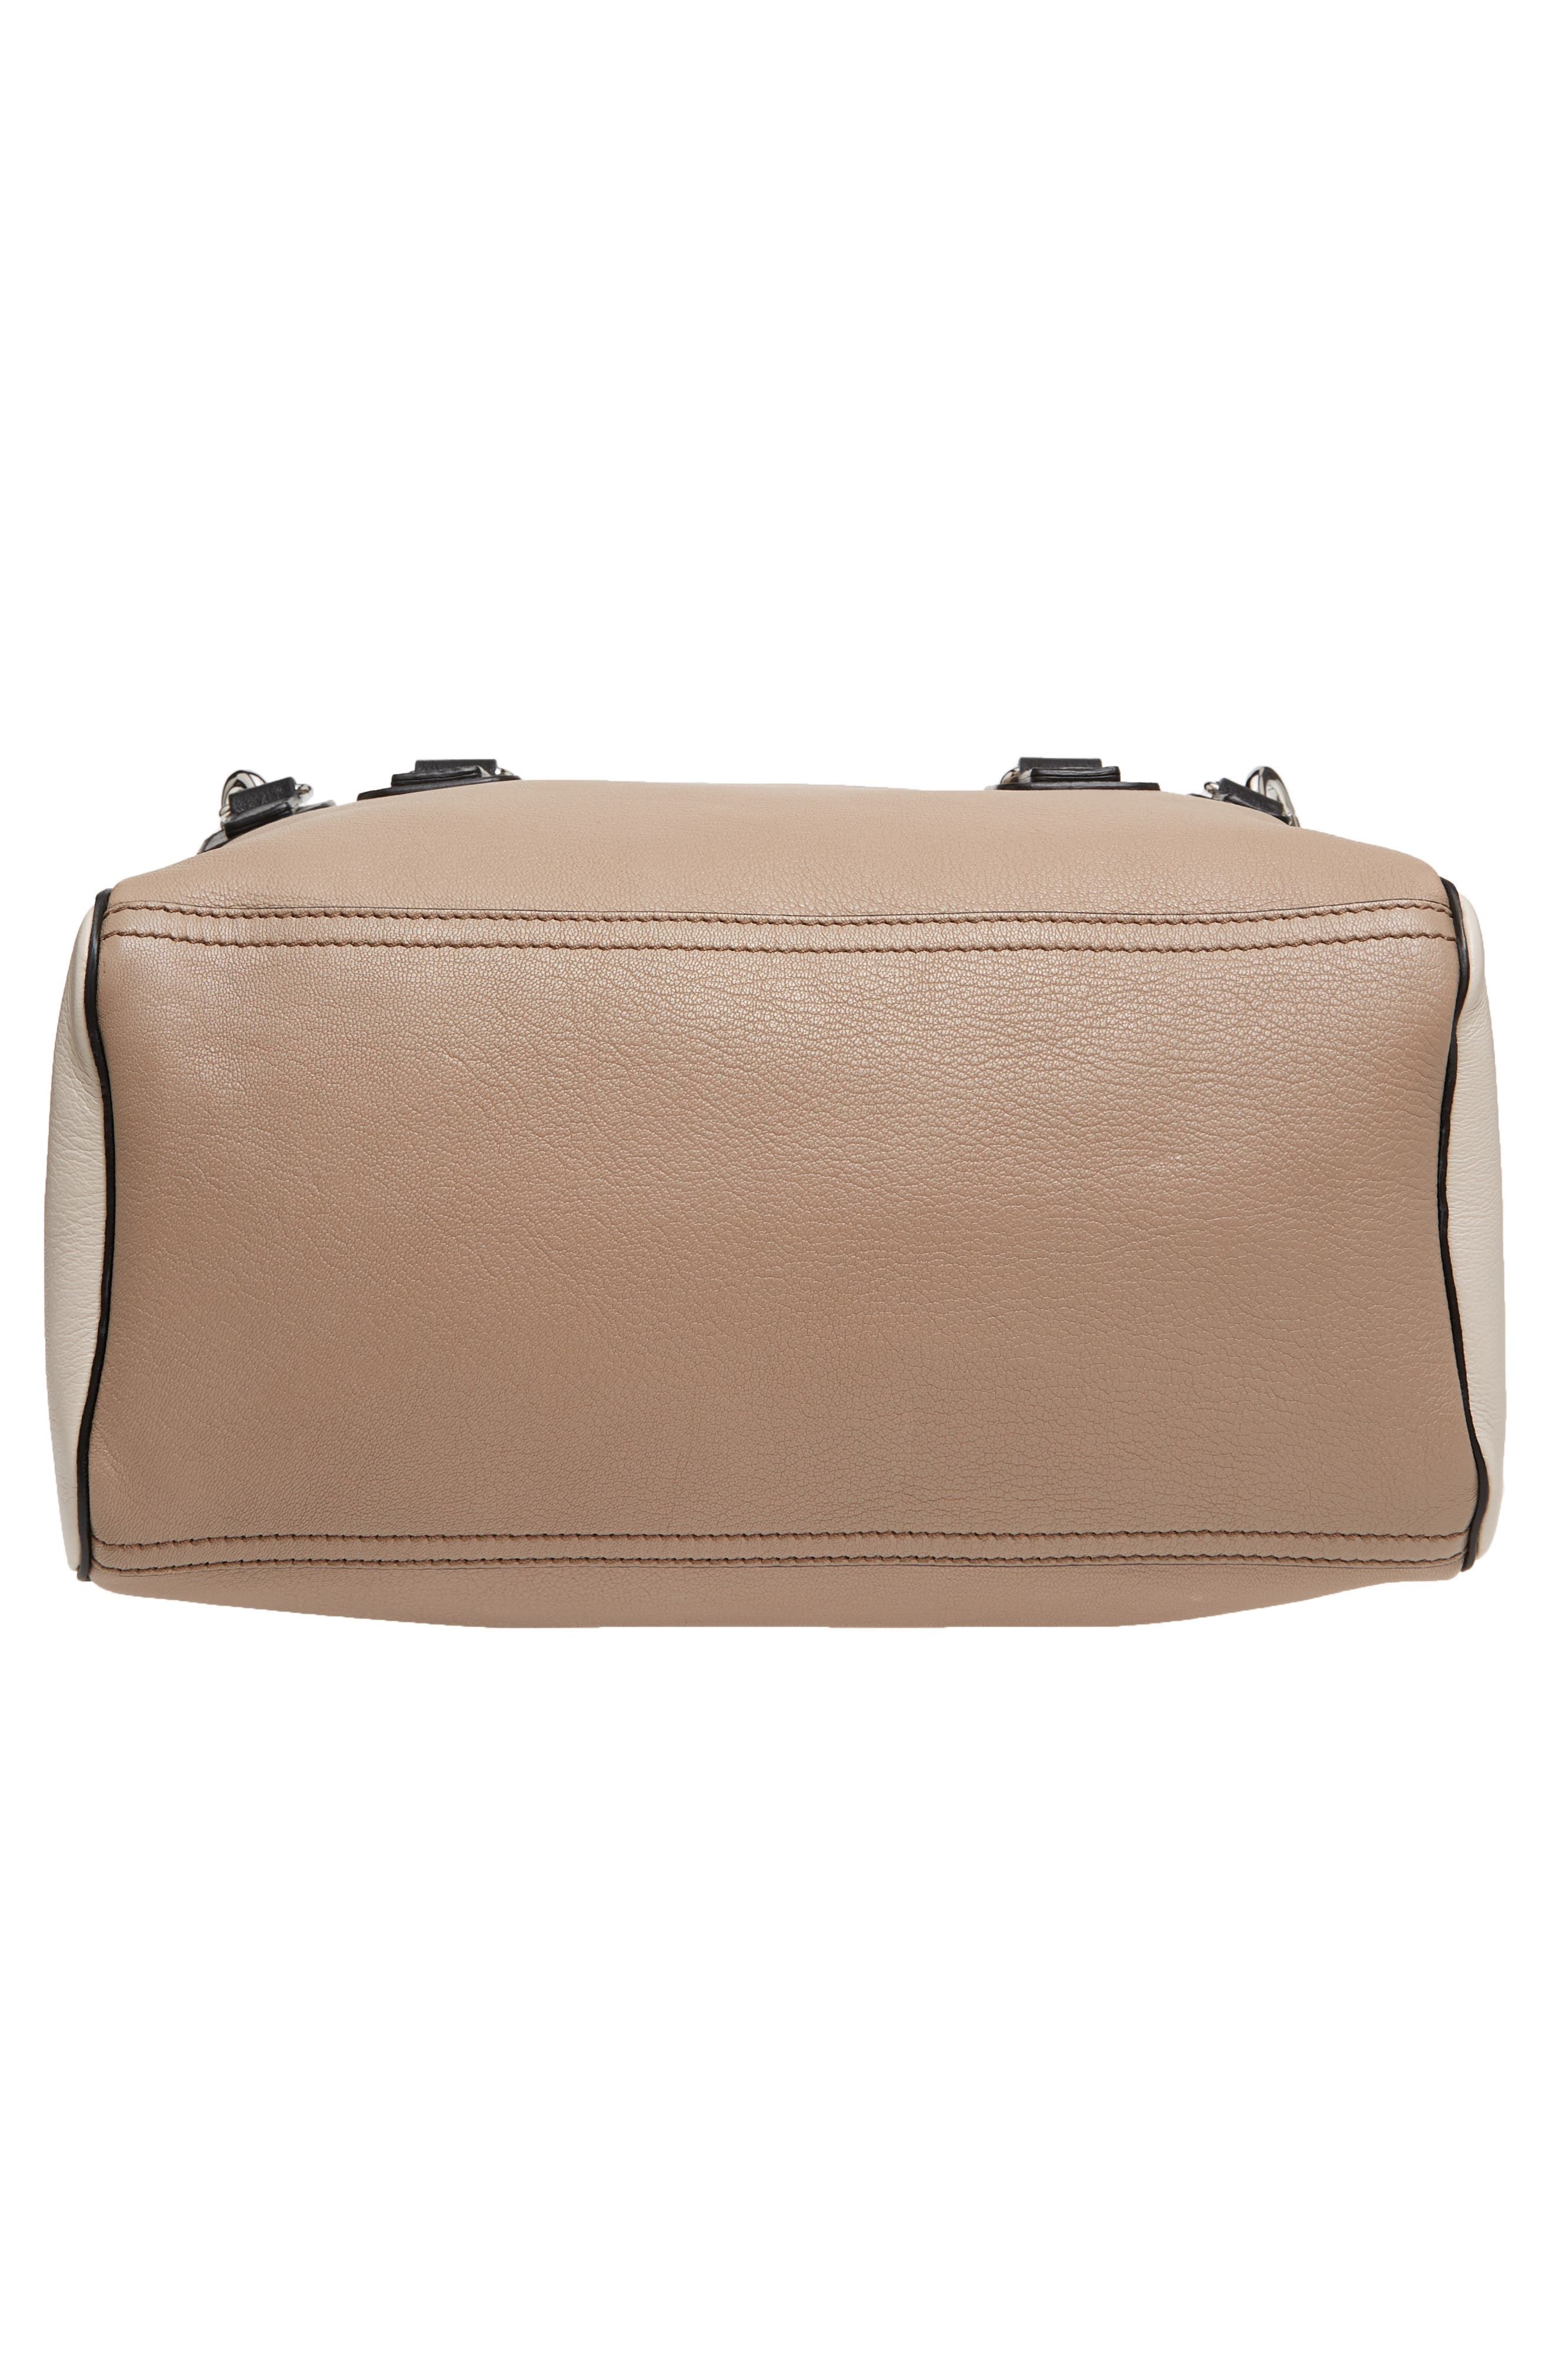 Medium Pandora Box Tricolor Leather Crossbody Bag,                             Alternate thumbnail 6, color,                             Linen